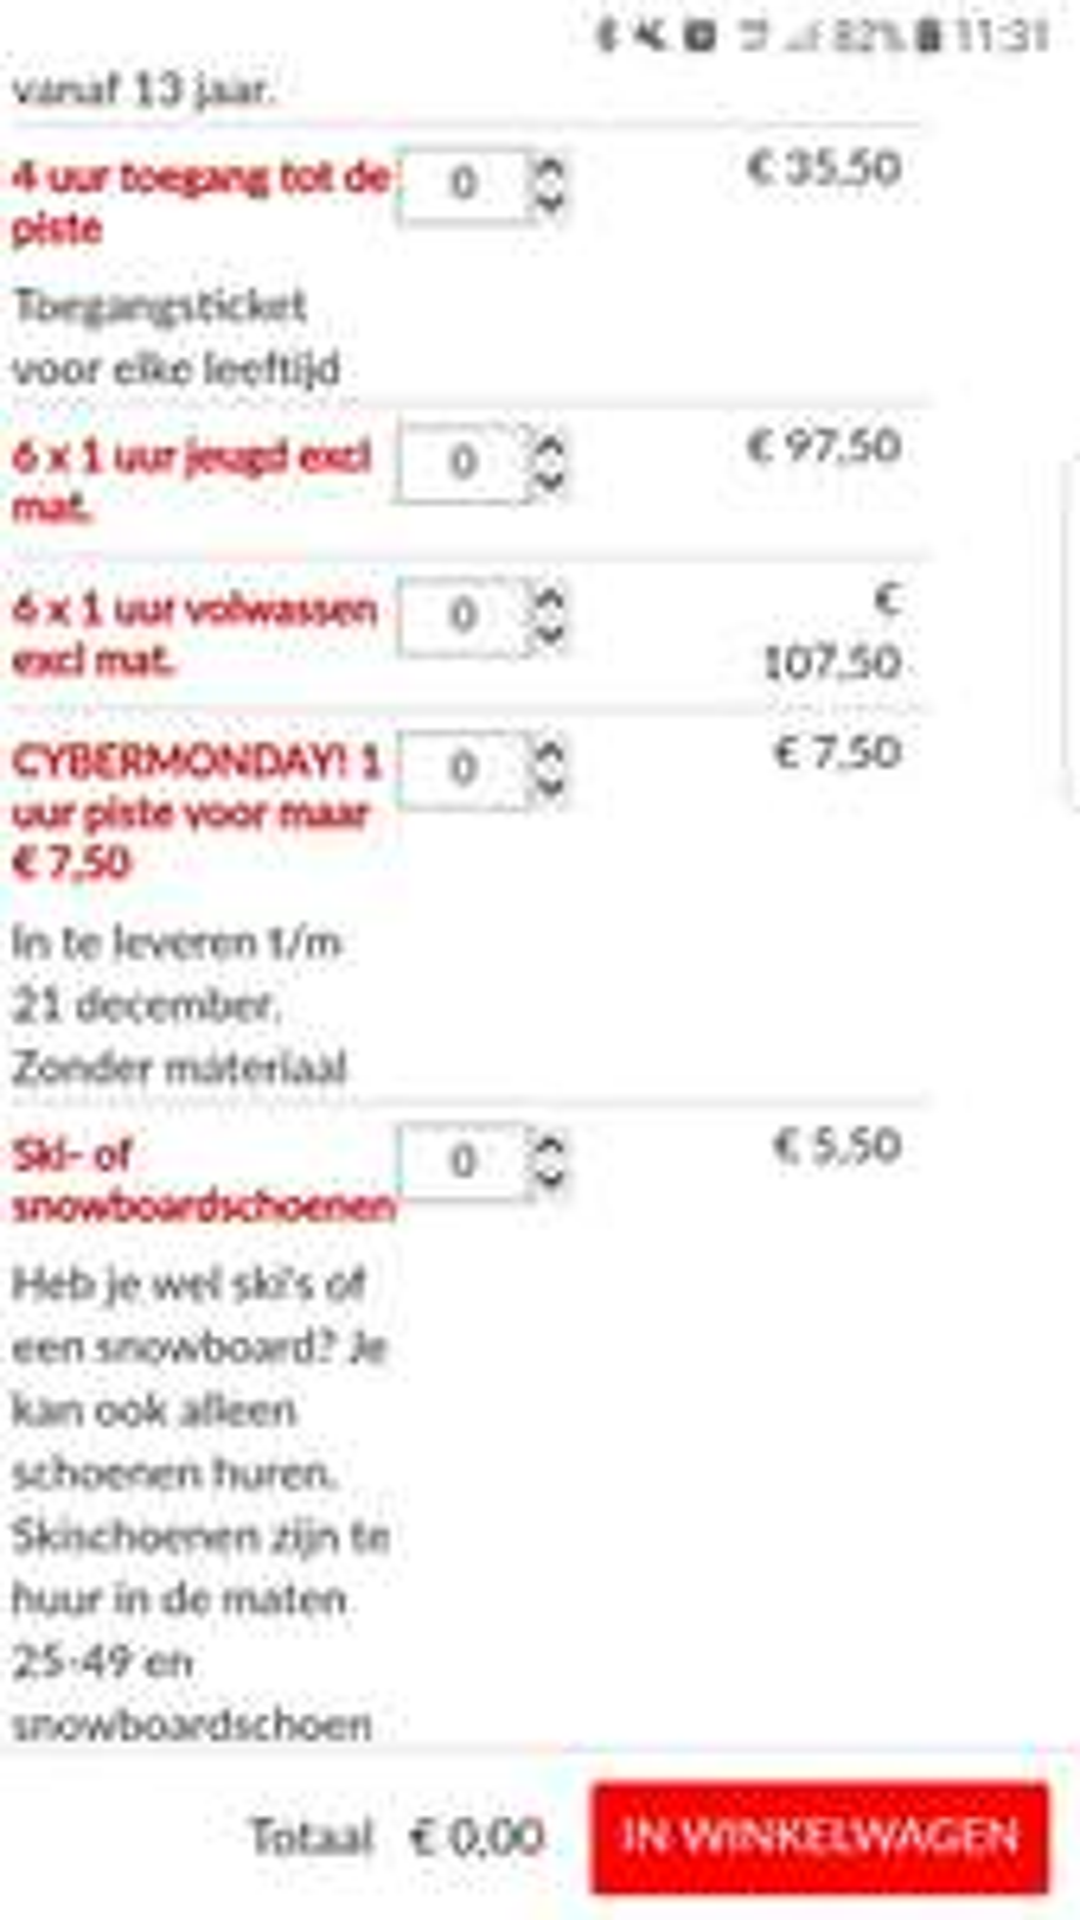 Snowplanet cyber Monday deal 63% korting